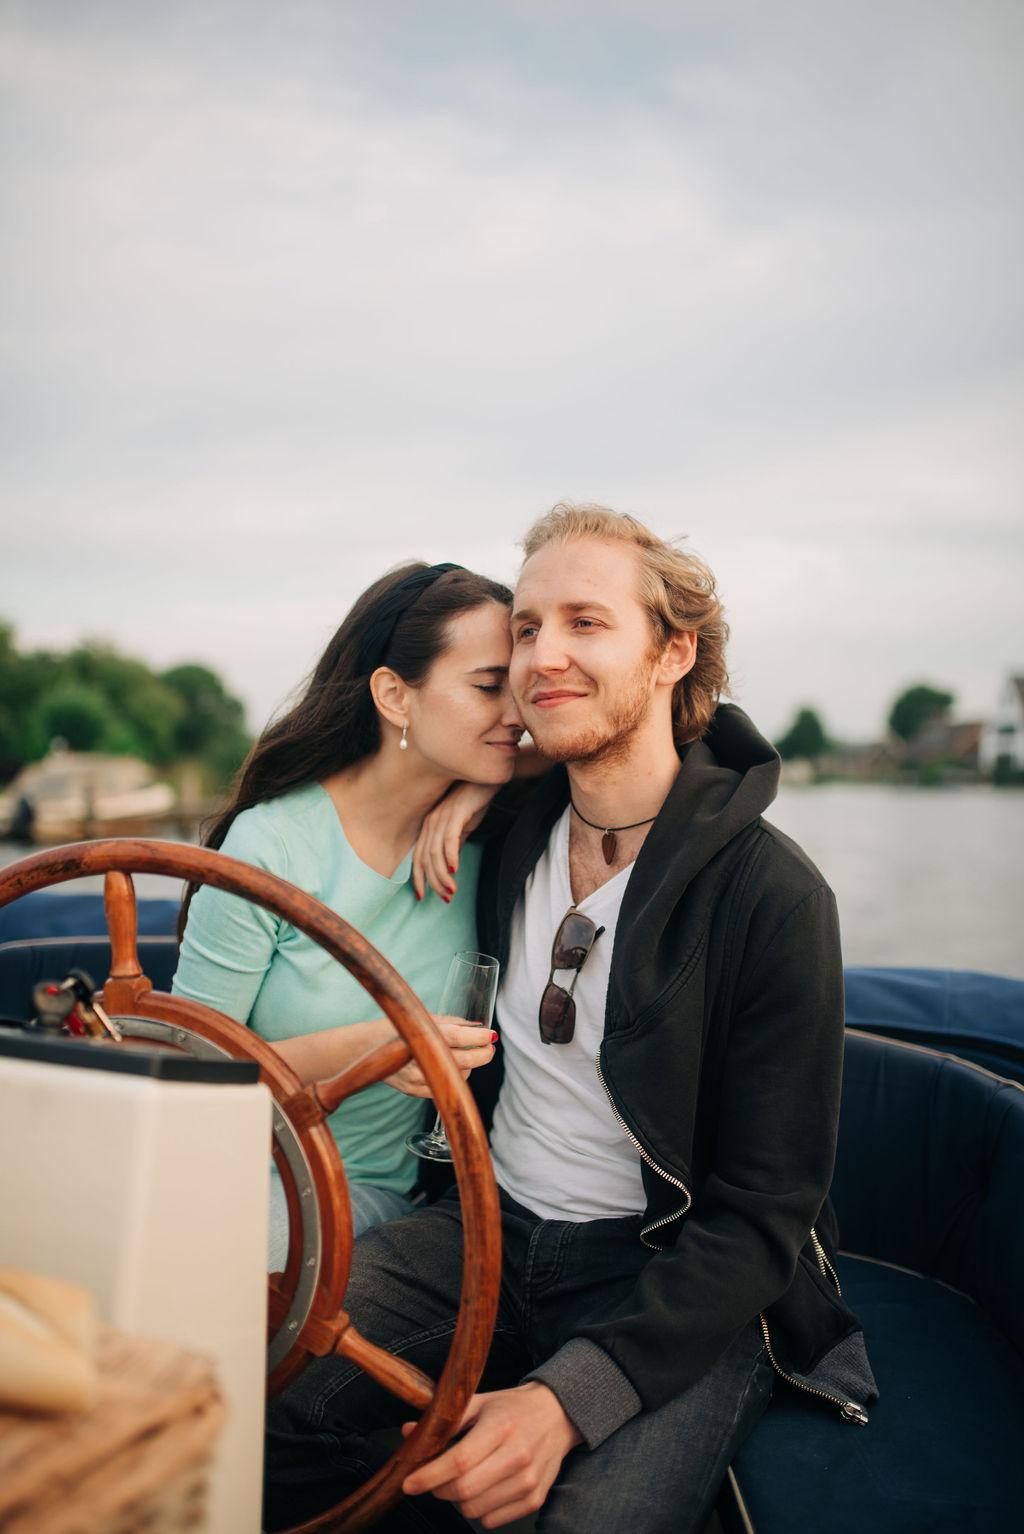 tatiana-couples-photographer-amsterdam-netherlands-taylor-content.jpg